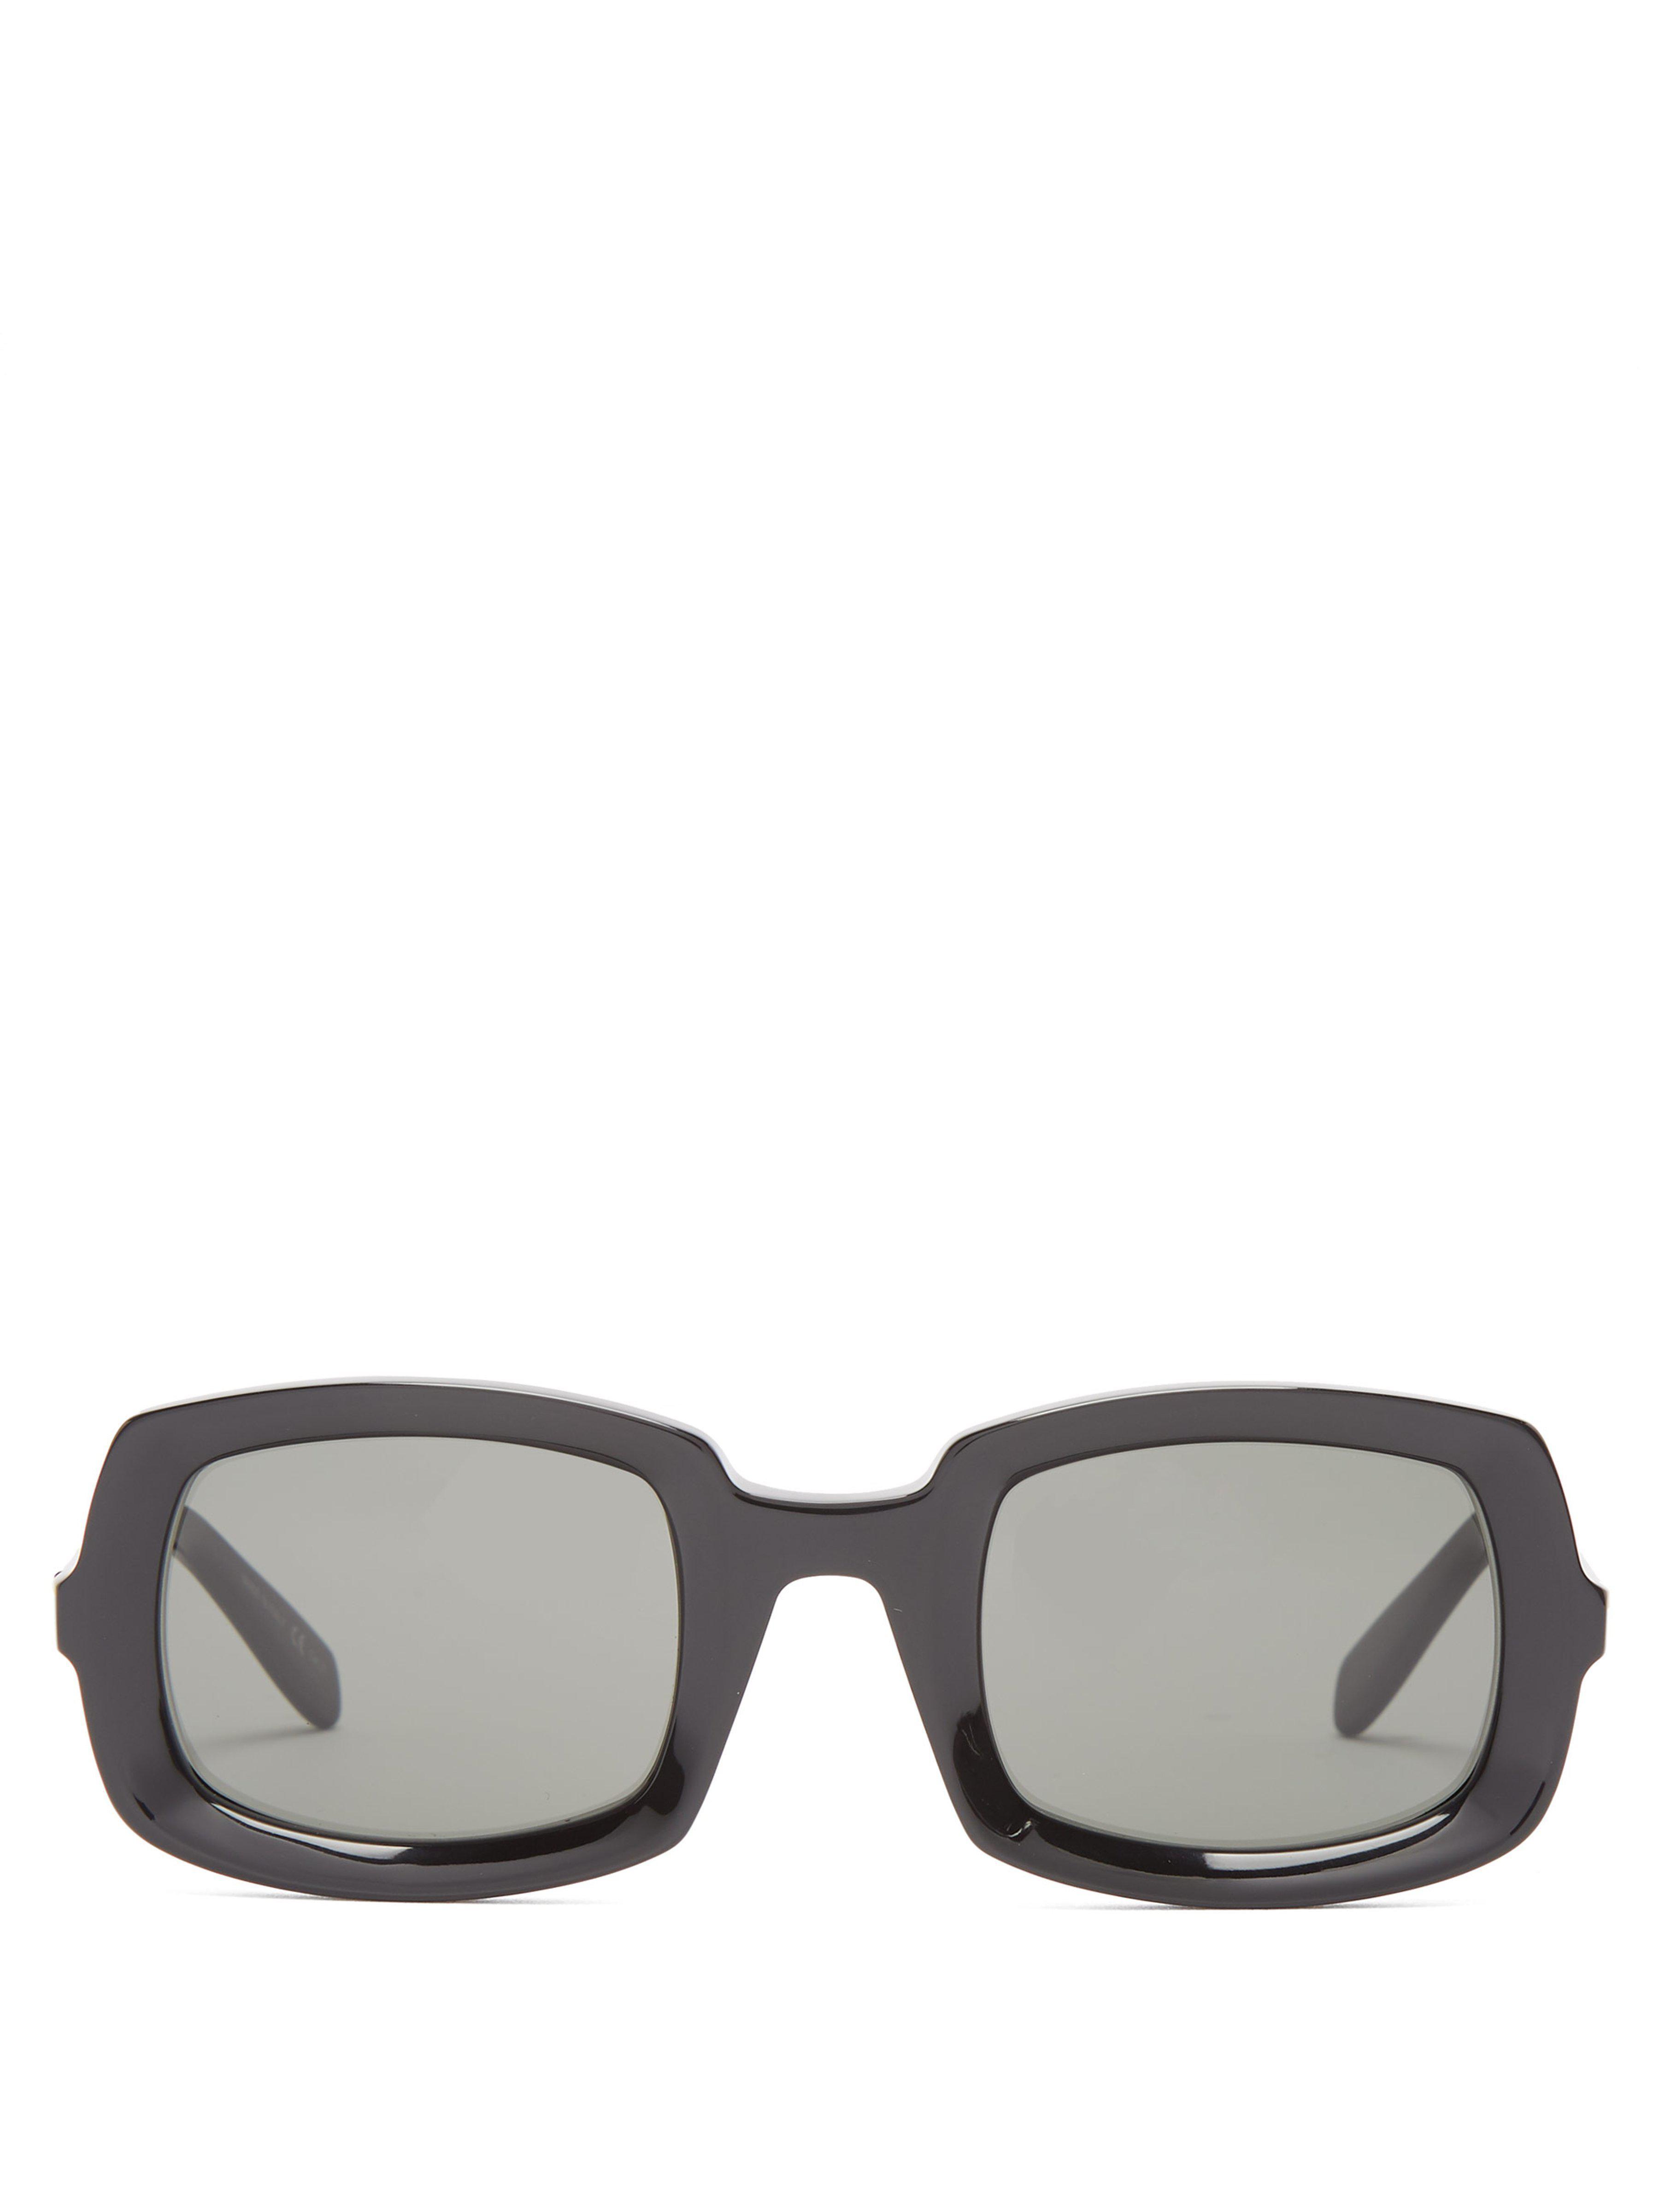 2e92a63f79c Saint Laurent Thick Frame Acetate Sunglasses in Black - Lyst